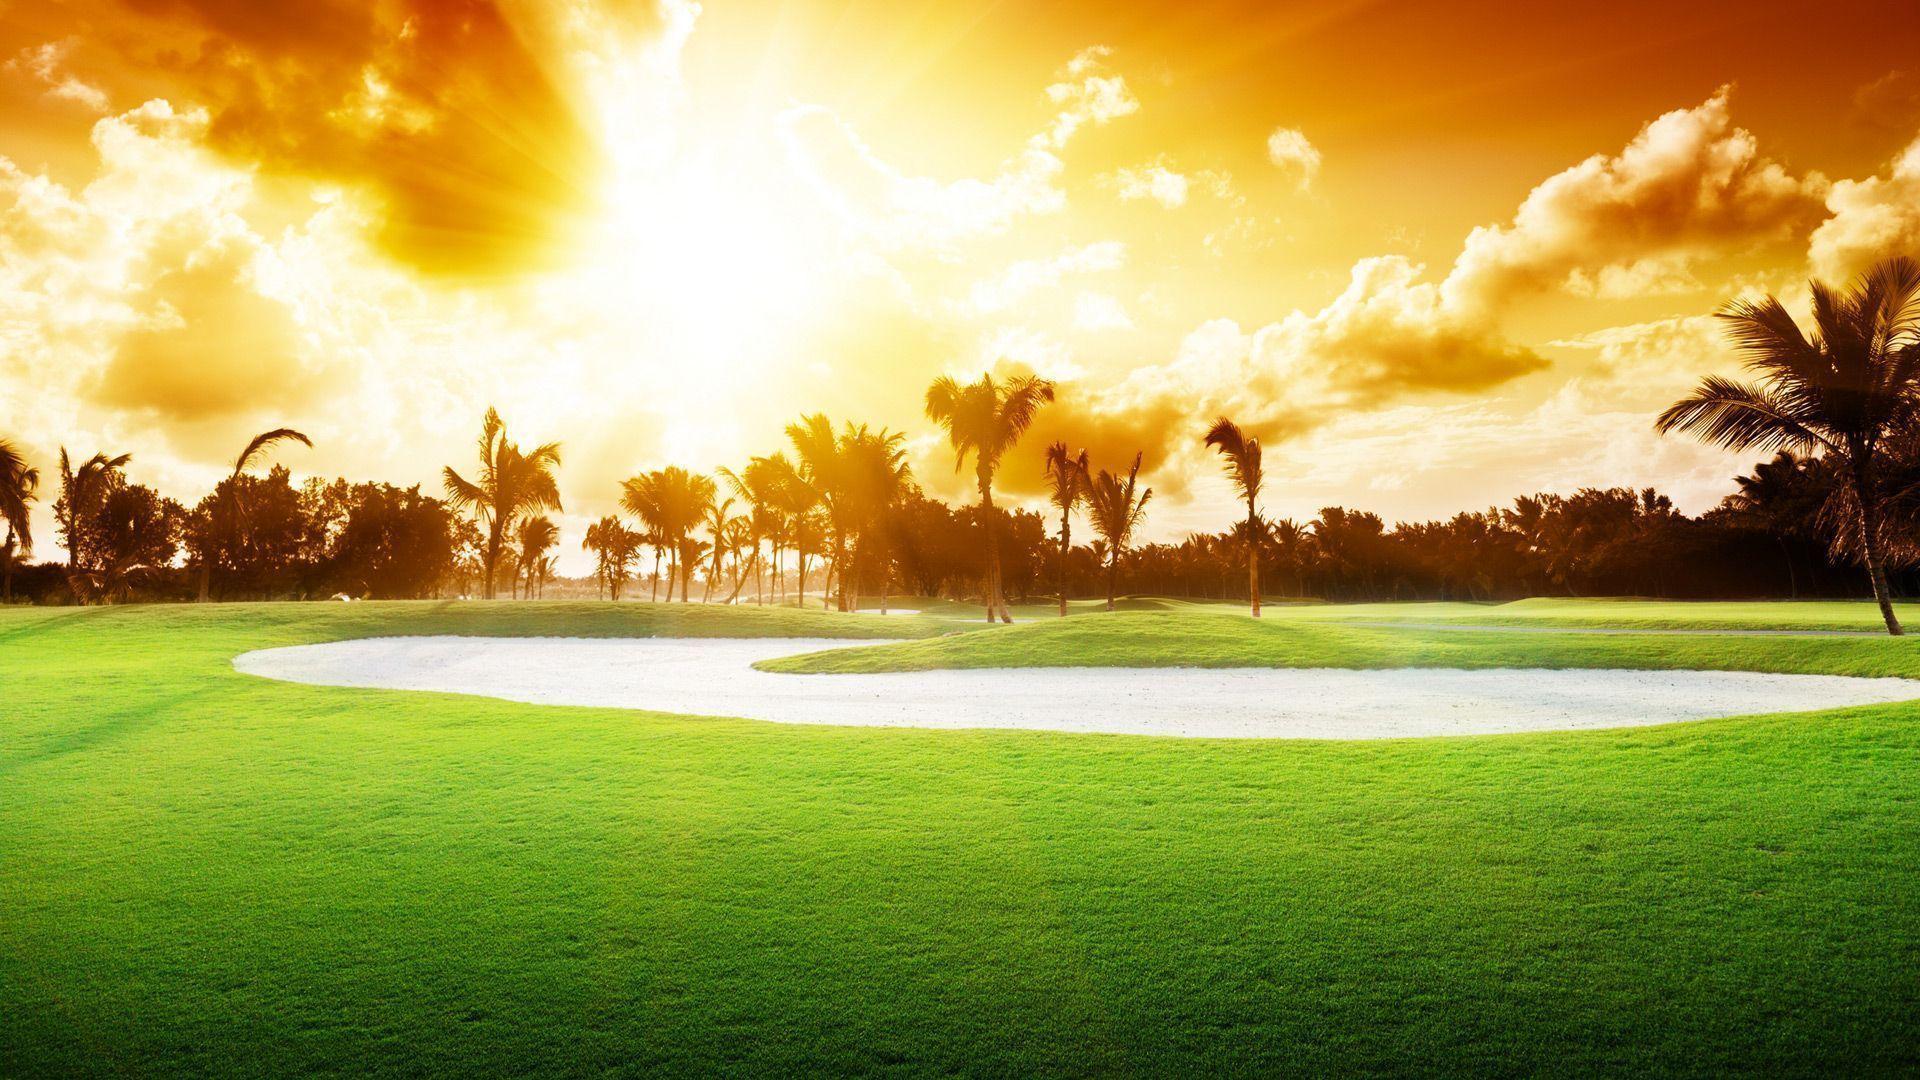 Golf wallpaper background